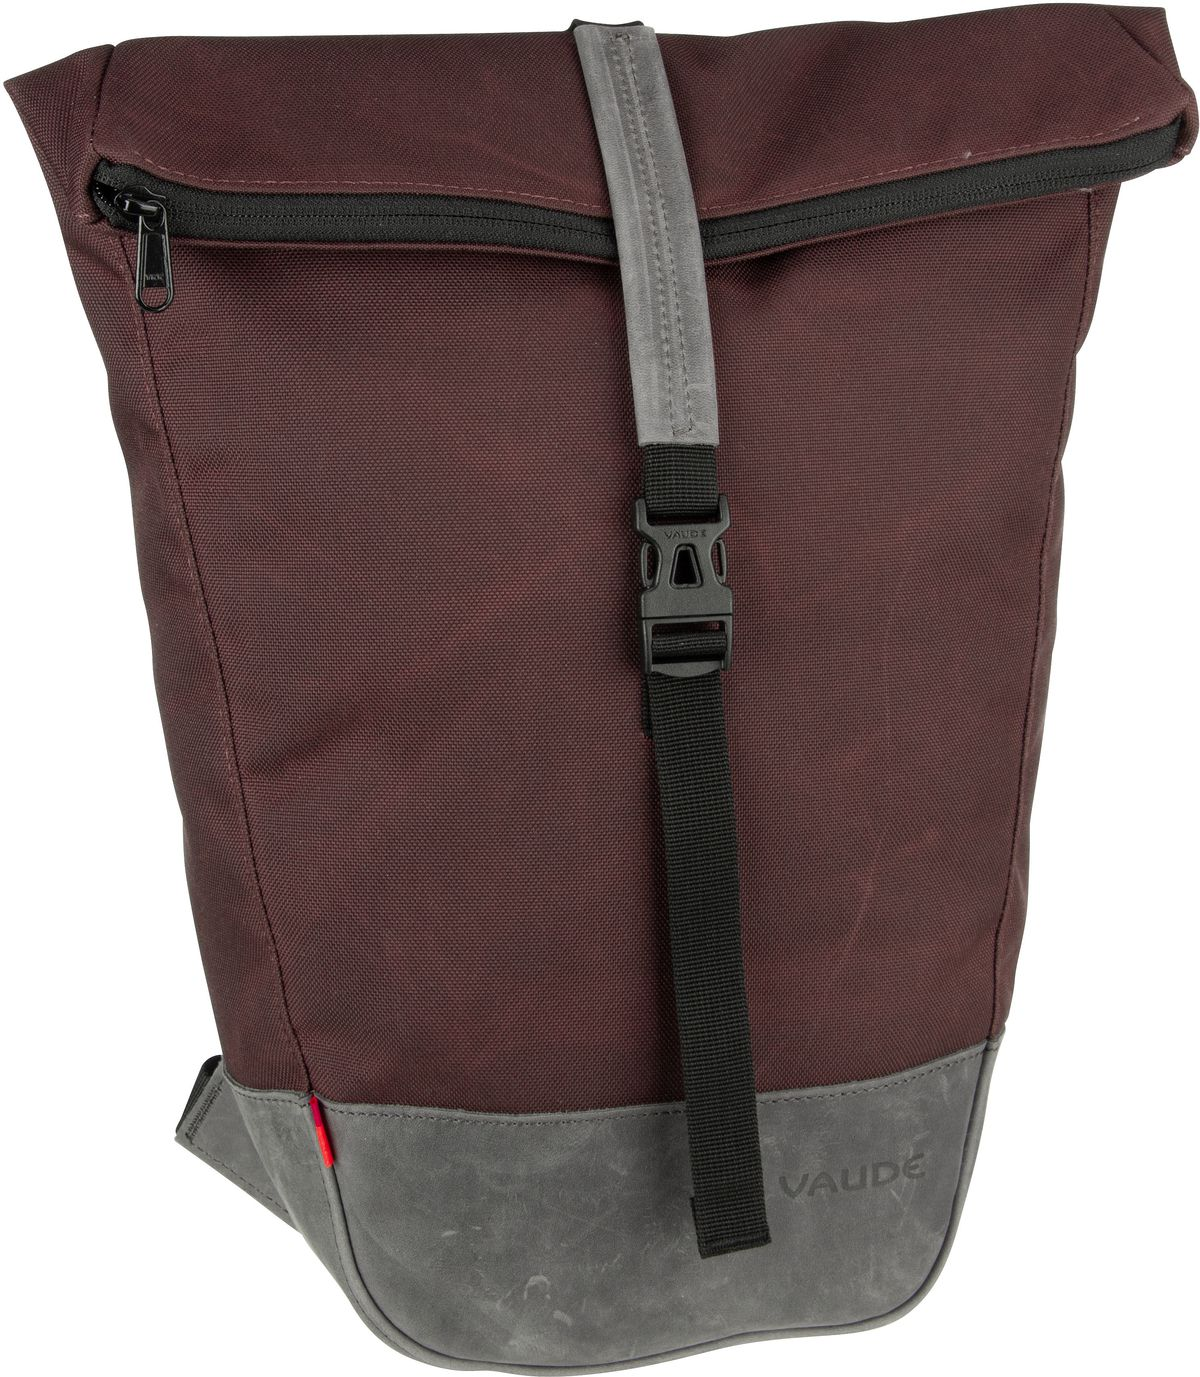 Rucksack / Daypack Bukit Raisin (10 Liter)